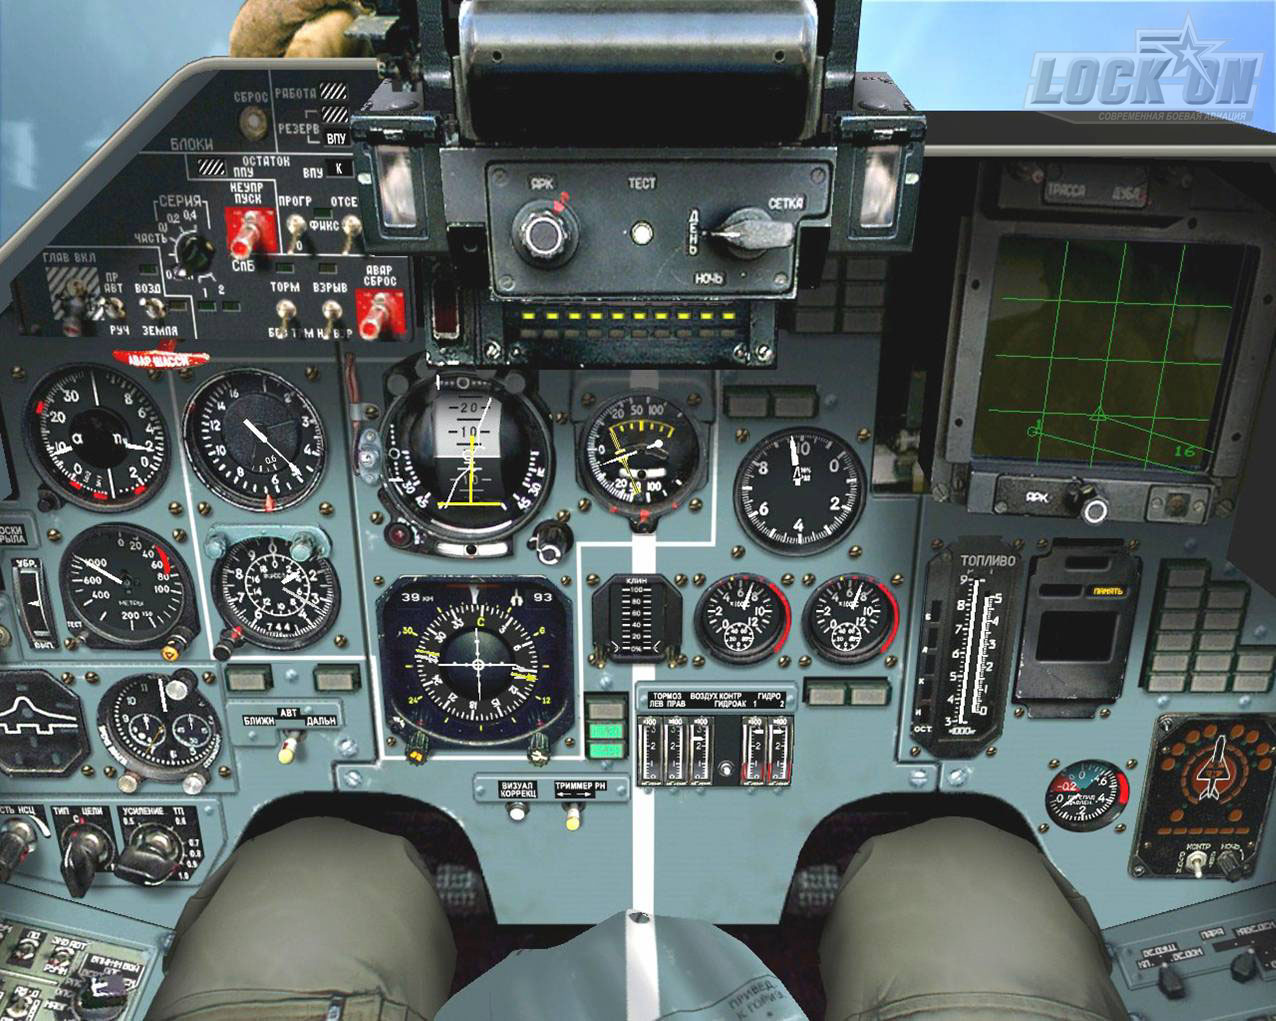 http://4.bp.blogspot.com/-6sTJvBbiNWs/TkpUNE55vPI/AAAAAAAAK0s/nqIPgRUHeuc/s1600/J-10+Cockpit+%252810%2529.jpg